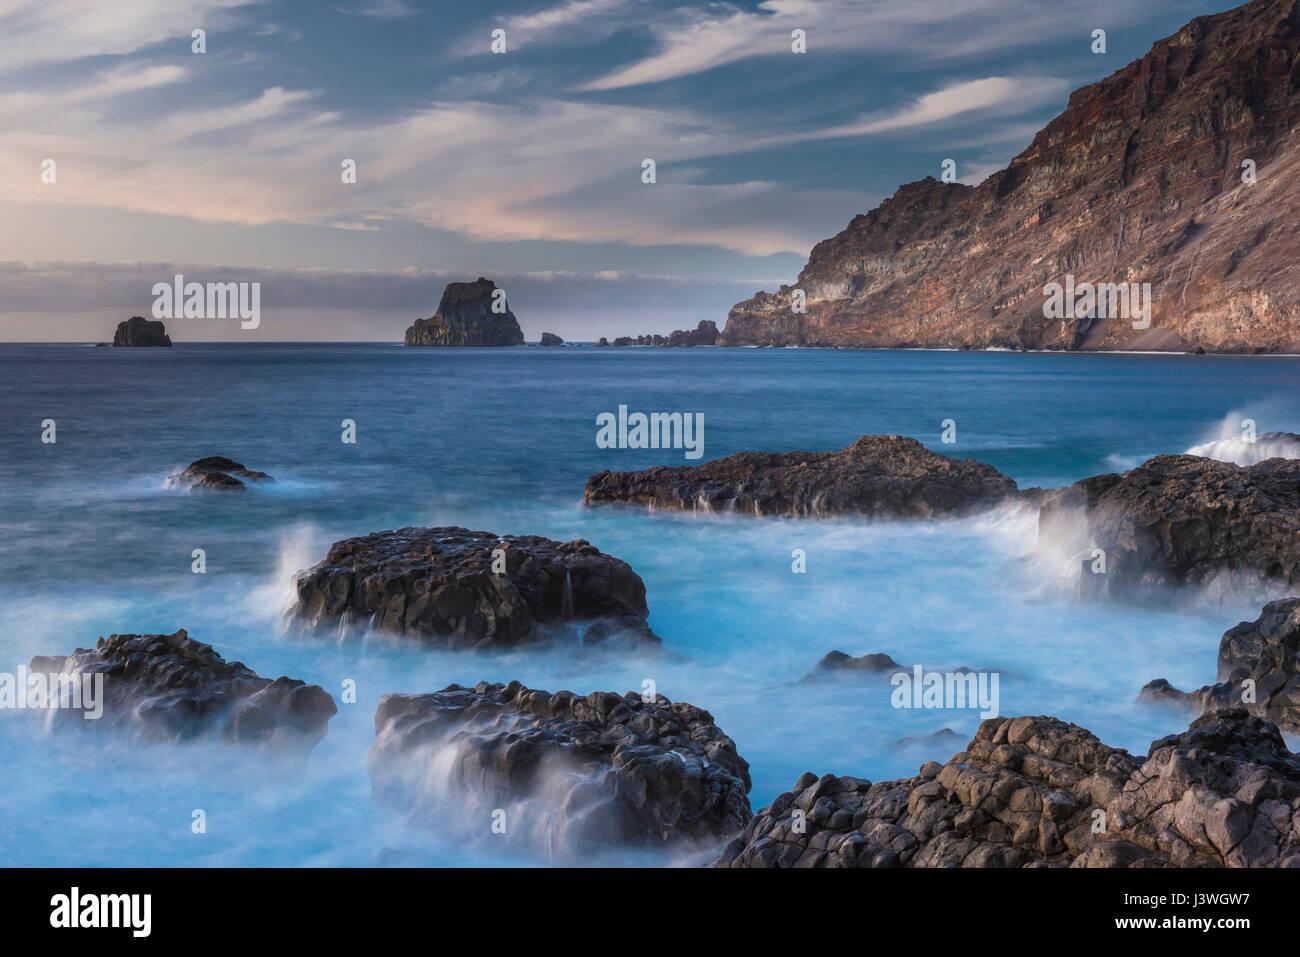 Columnar jointed lavas and the sea stacks of Roques de Salmor, Las Puntas, El Hierro, Canary Islands - Stock Image